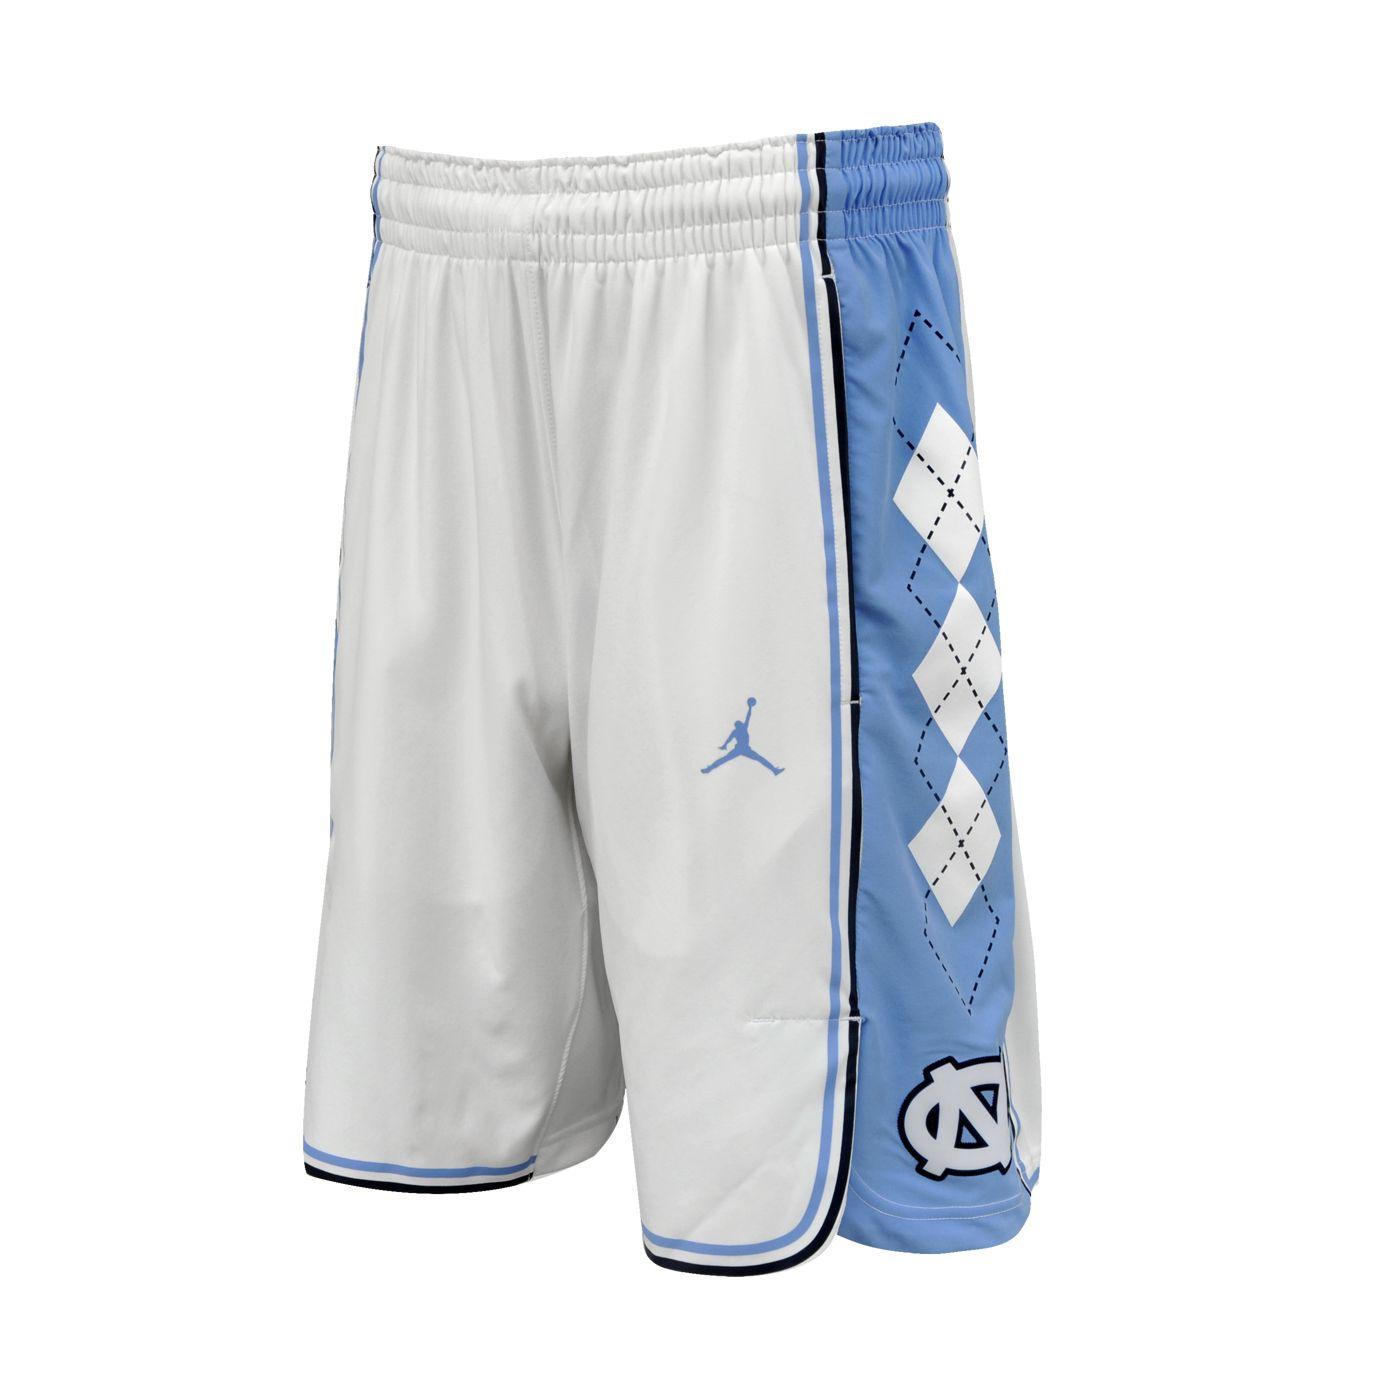 7445539576828b Johnny T-shirt - North Carolina Tar Heels - Nike Authentic Basketball Shorts  (White) by Nike